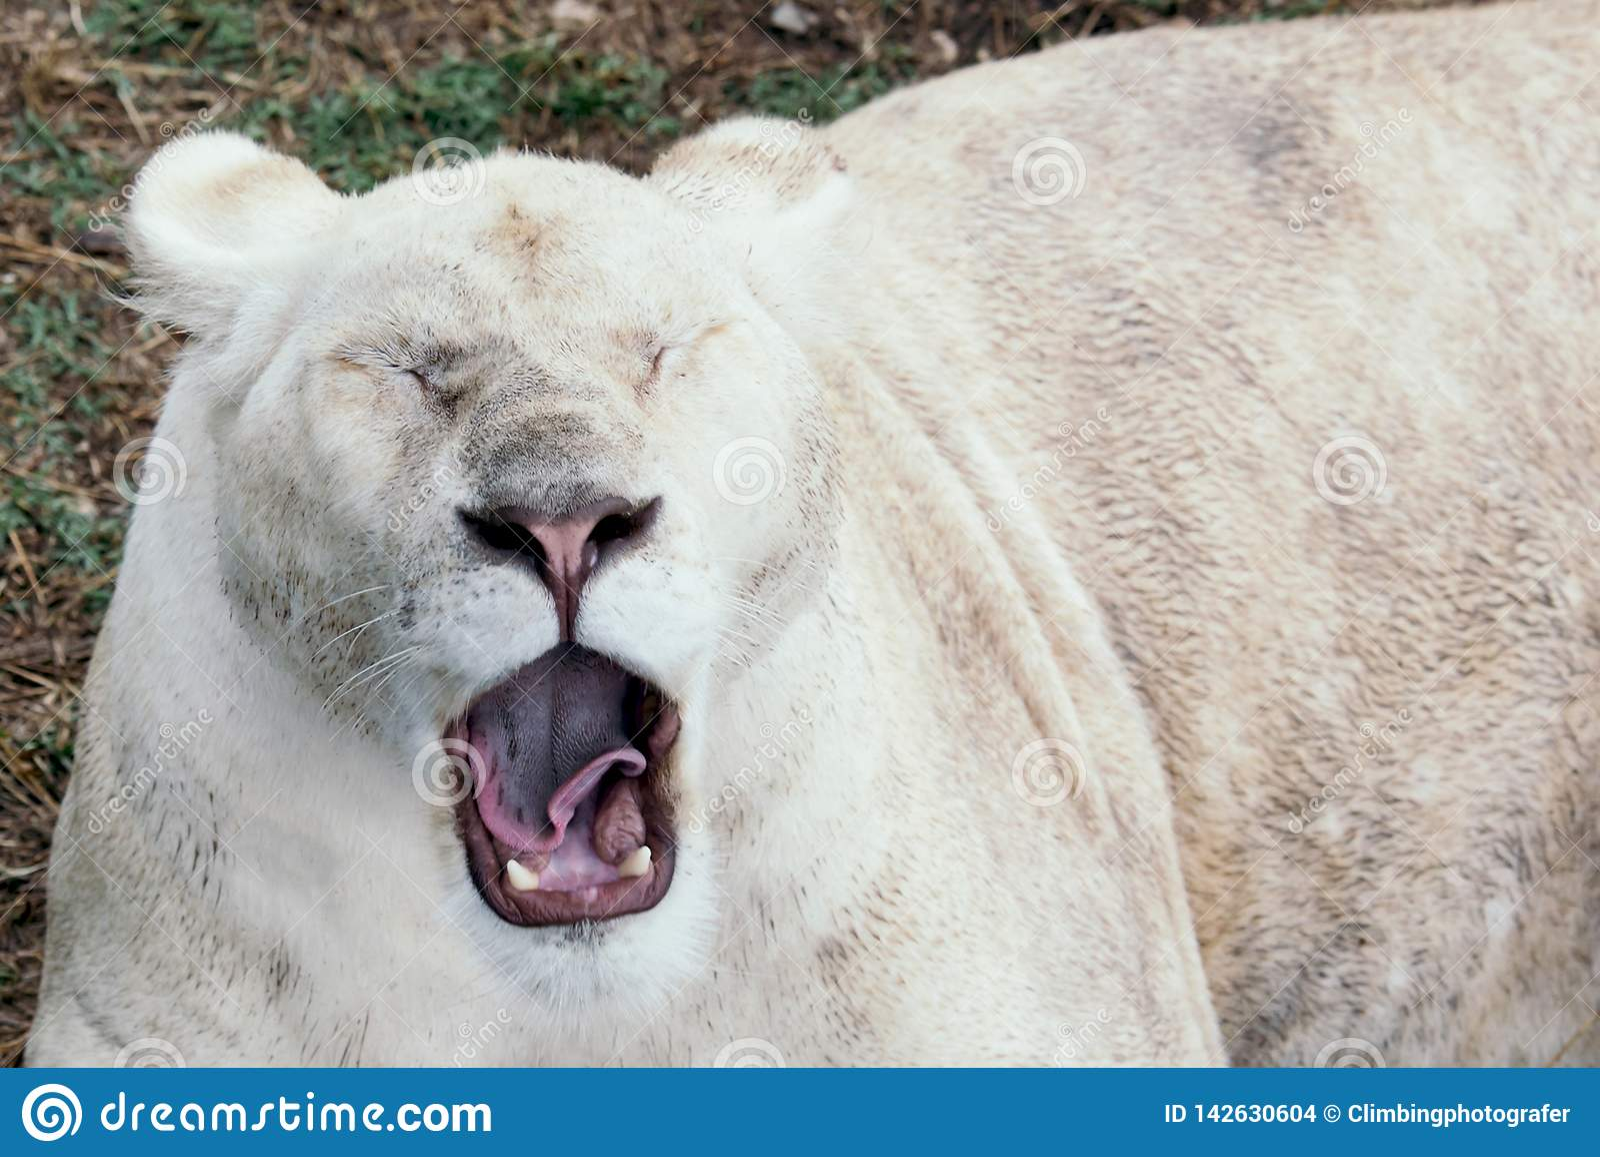 Bocejos do leão no jardim zoológico